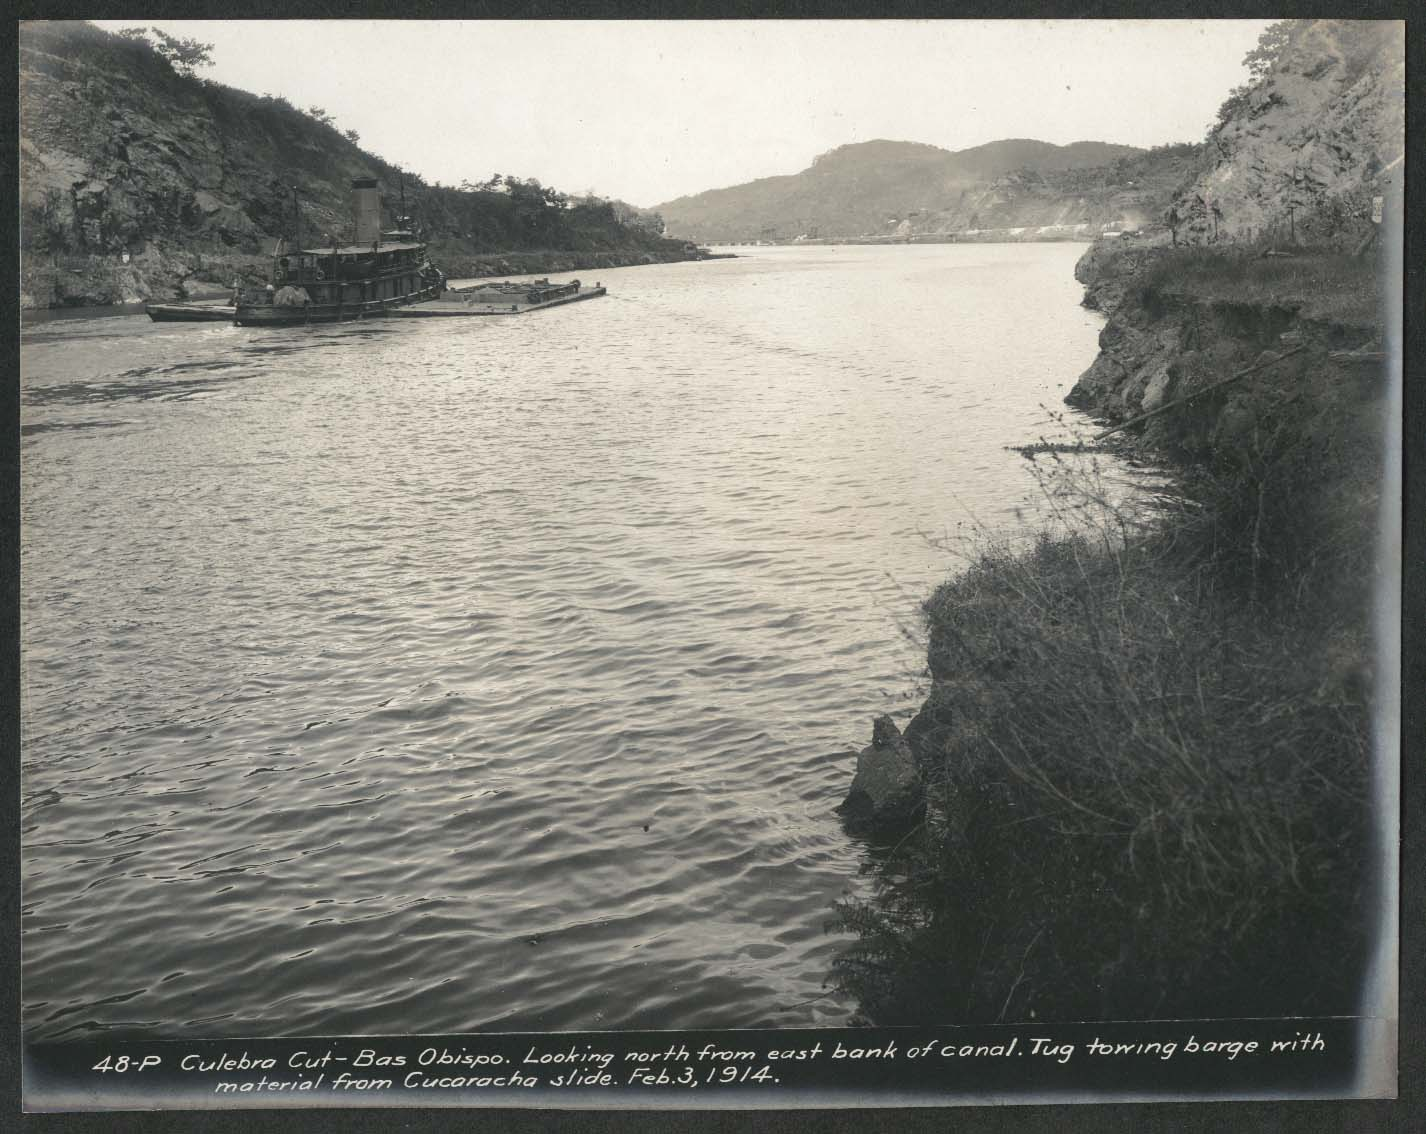 Image for Panama Canal photo 1914 Culebra Cut-Bas Obispo tug tows barge from Cucaracha